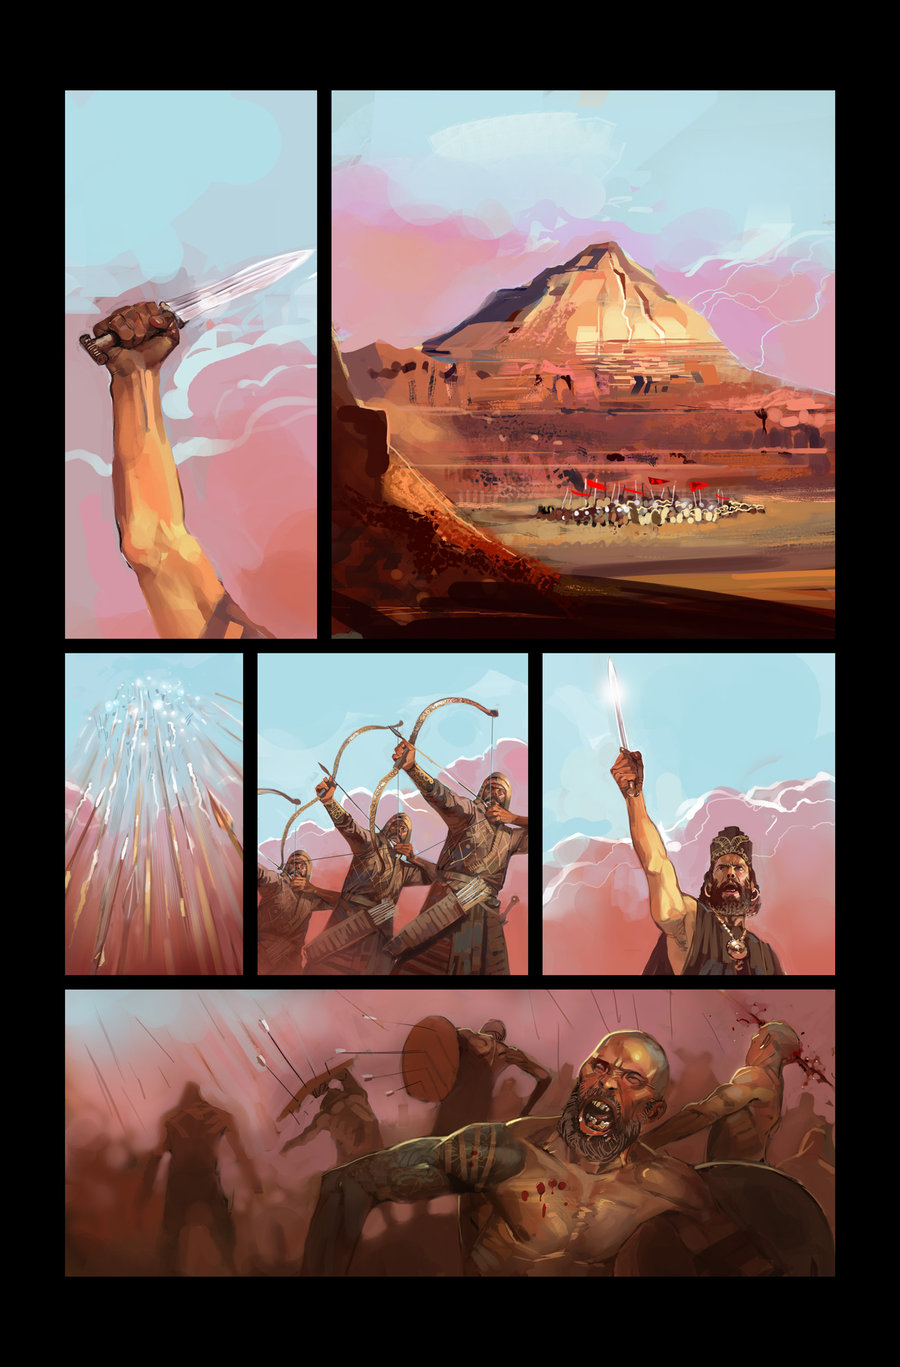 comic_page_no_1_by_shanyar-d4dbzwe.jpg